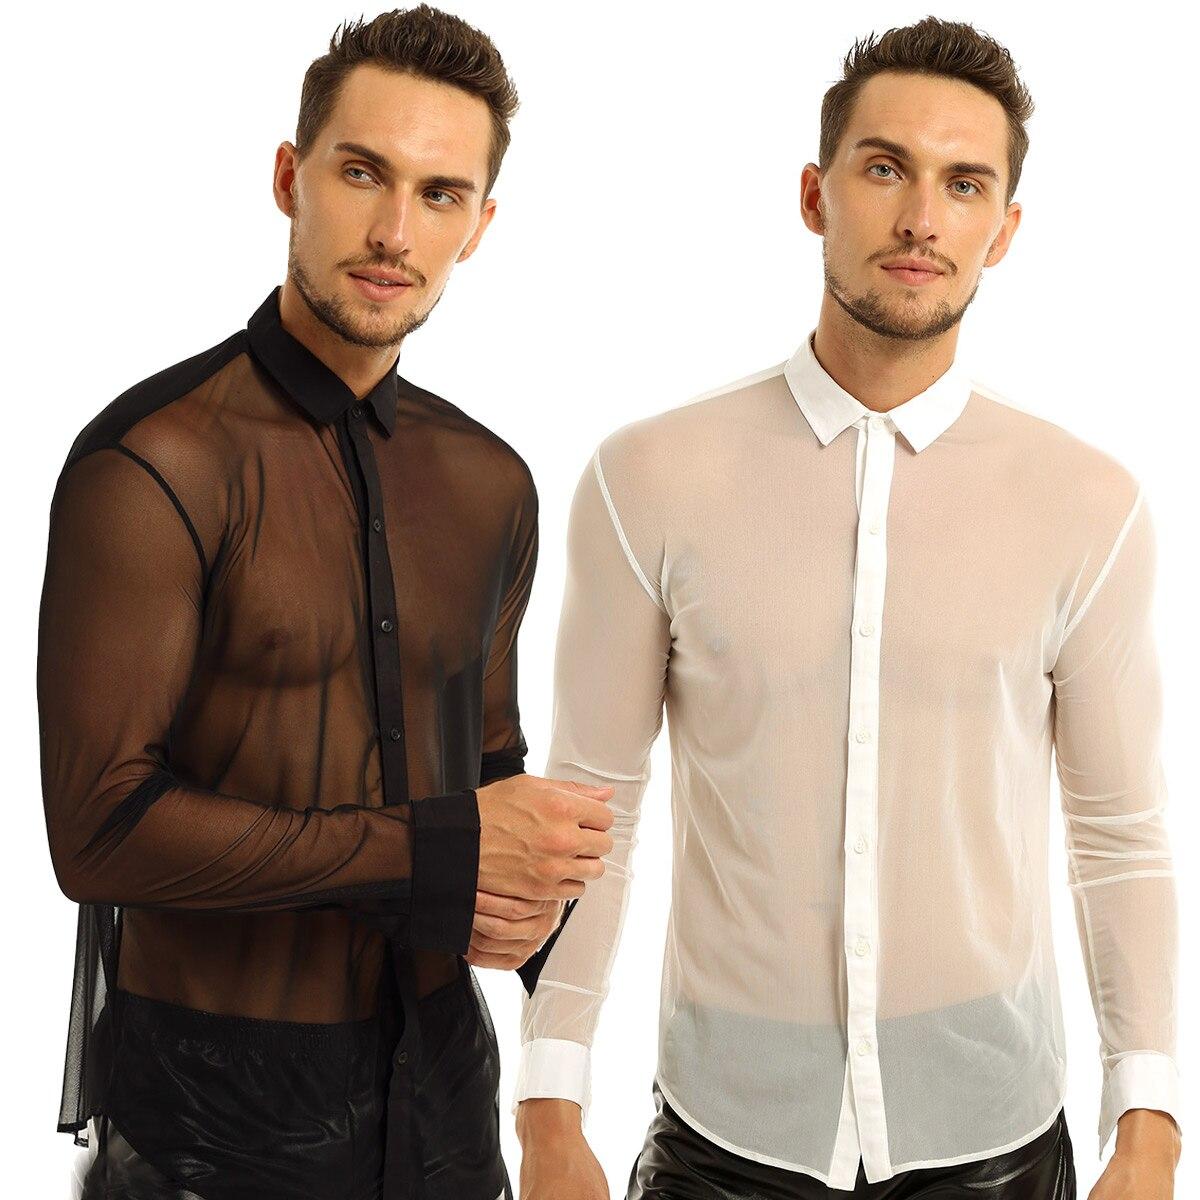 Mens Mesh See Through Shirts Long Sleeve Transparent Tee Top T-Shirts Club Wear